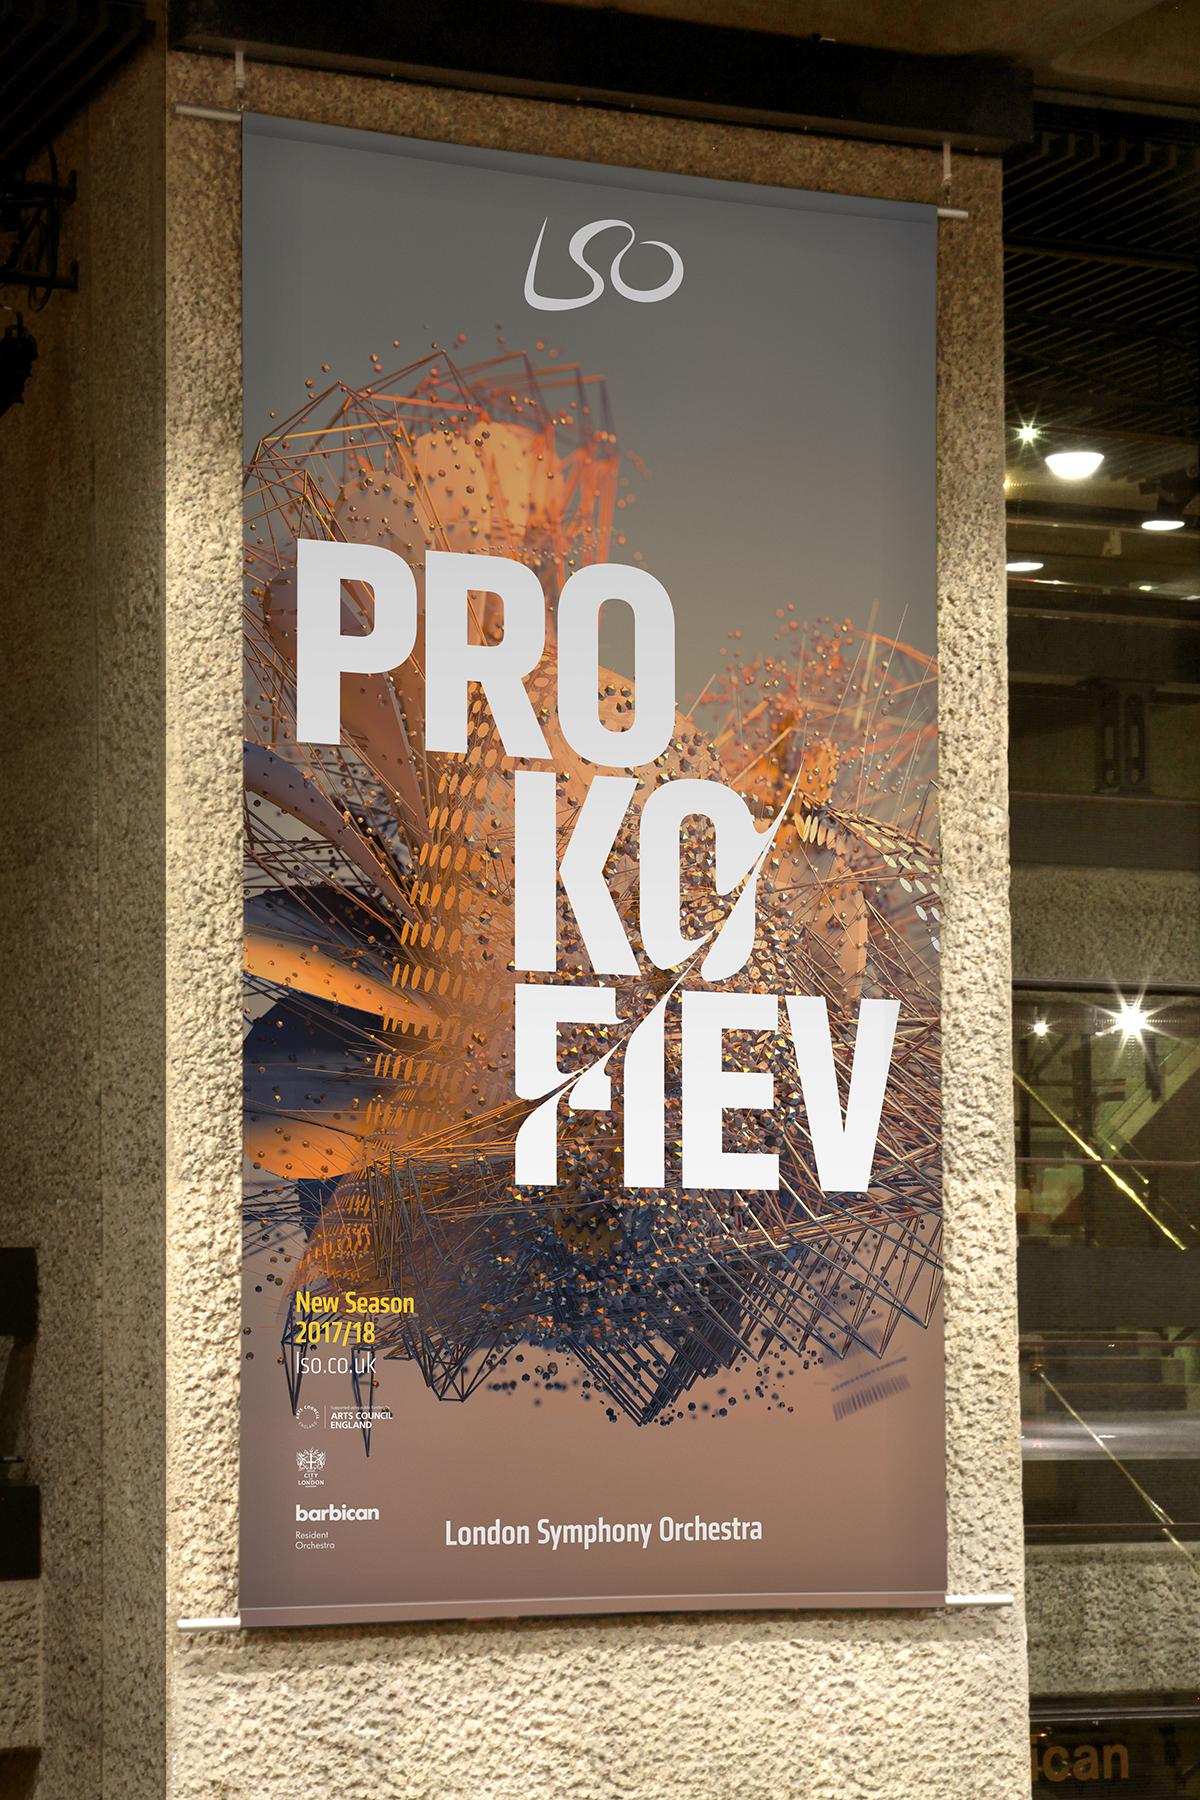 LSO Prokofiev poster